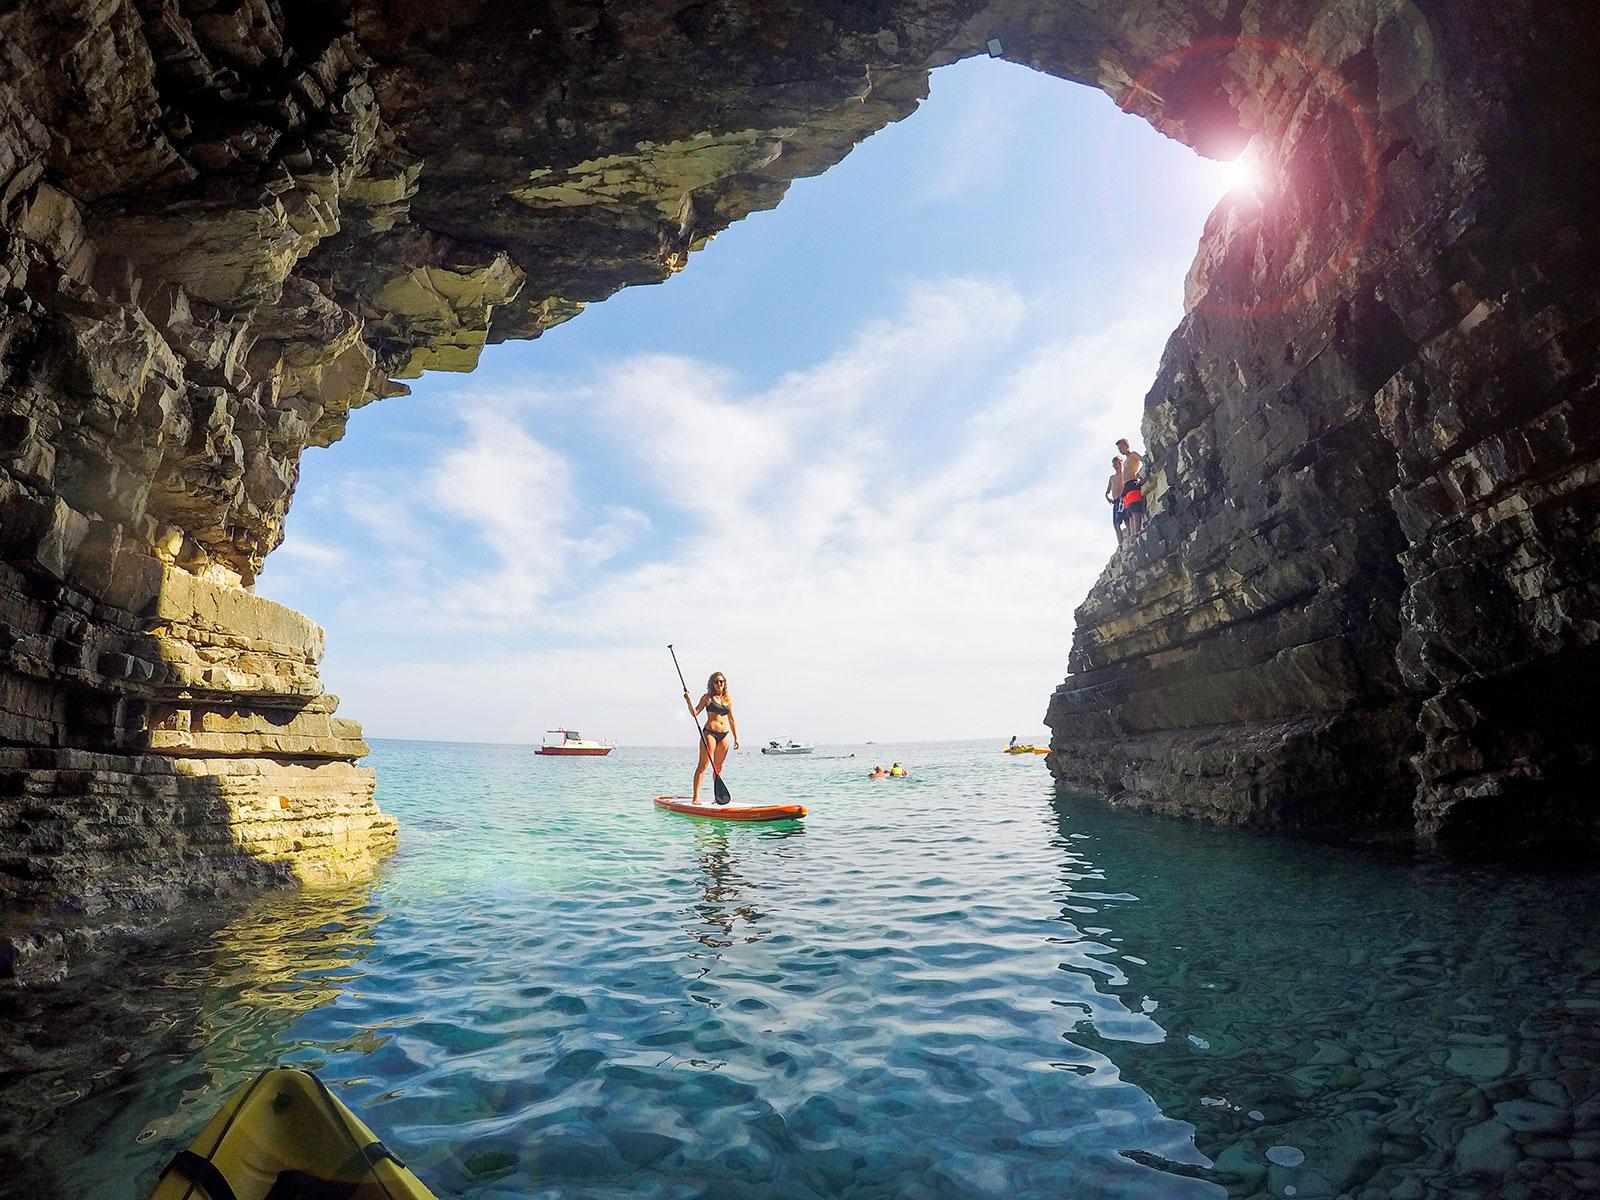 Sup tour around islands